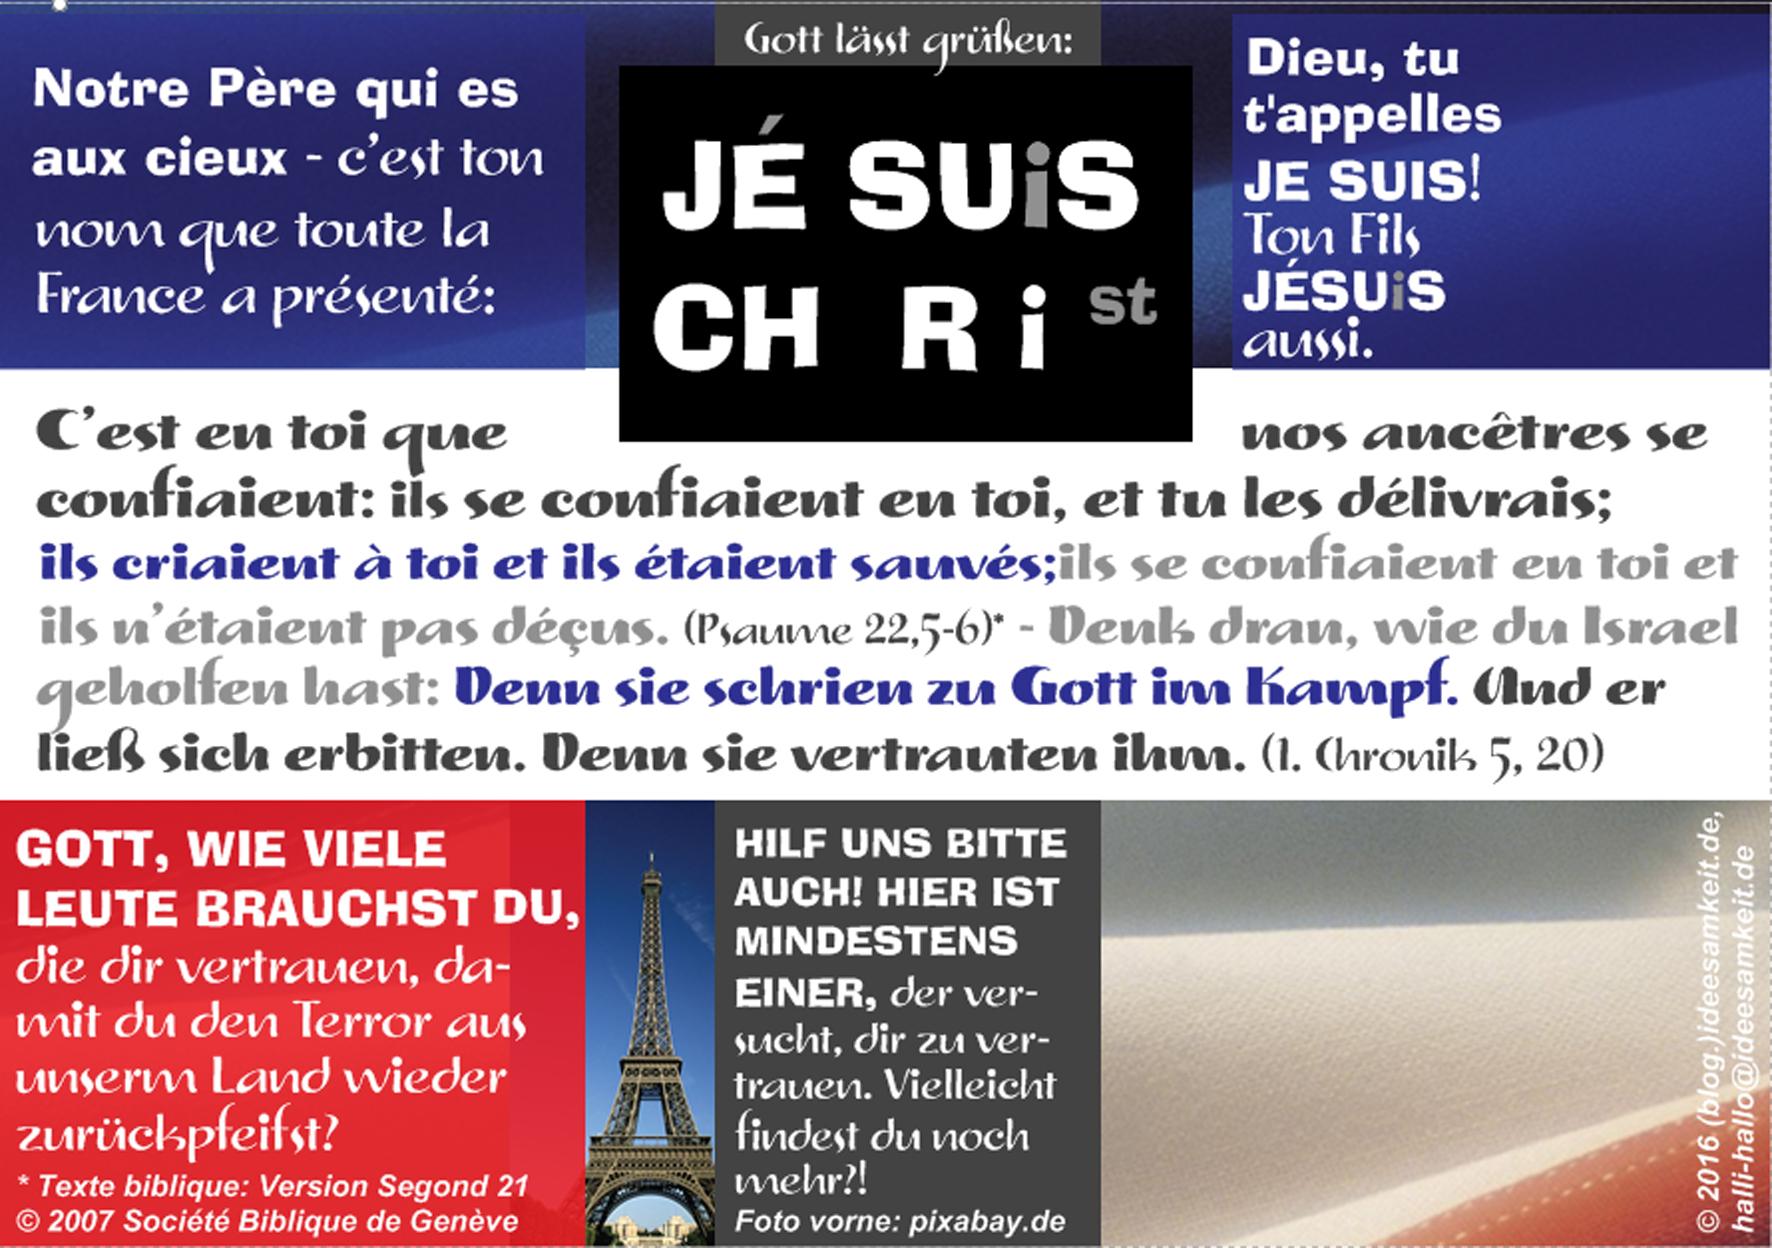 Frankreich-Nizza-pixabay-Alexas-Fotsos-nice-1518487-bea2-rueck-vorsch